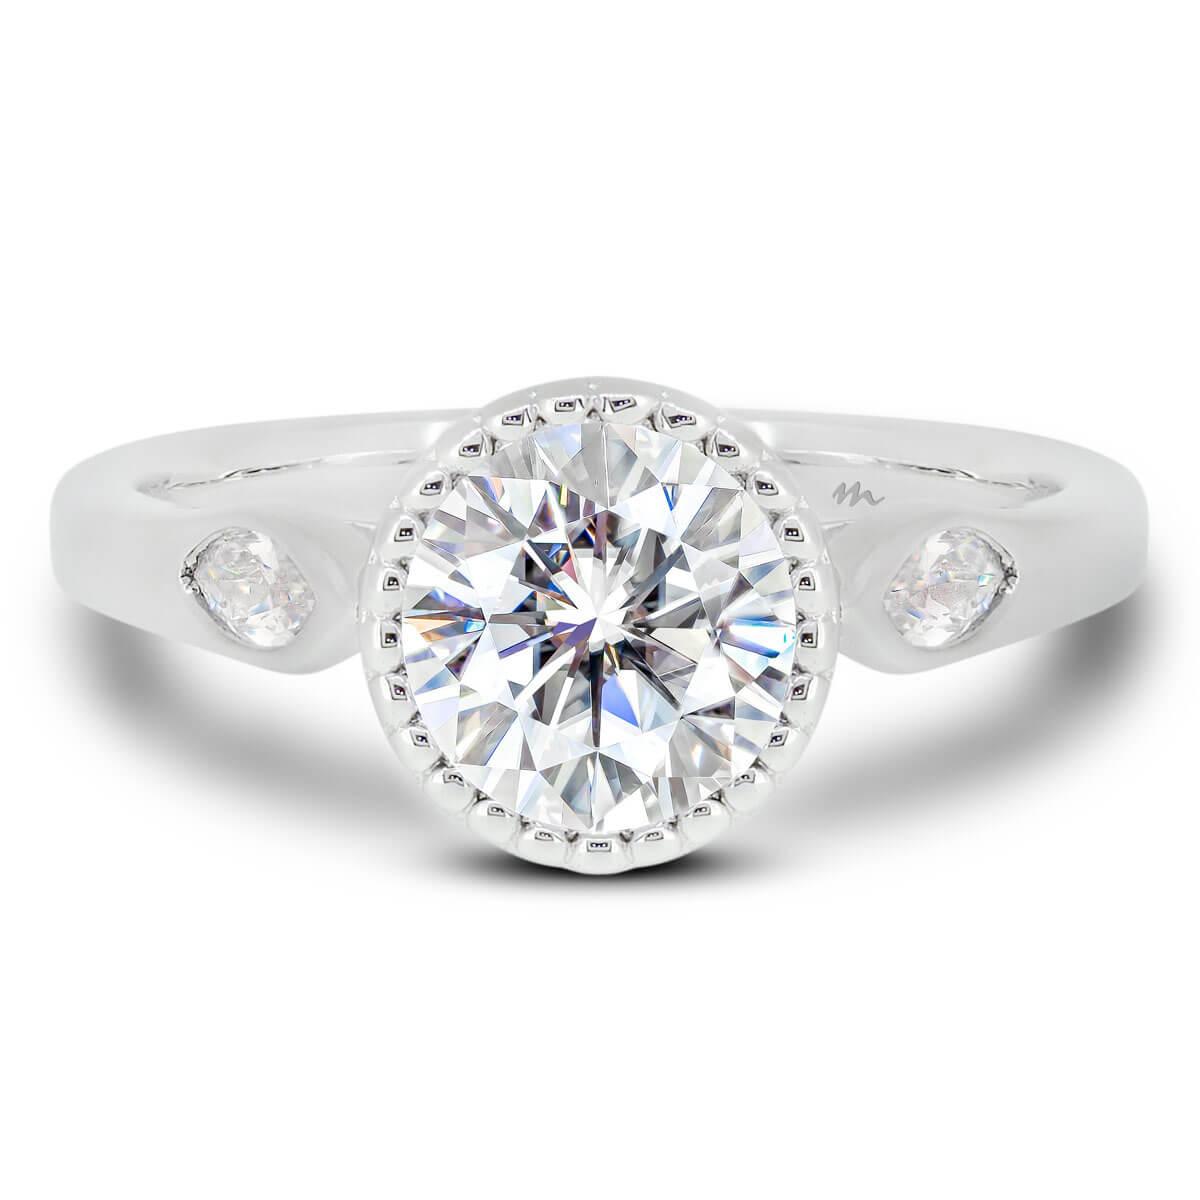 Dalia Vintage Halo Moissanite Ring Front View